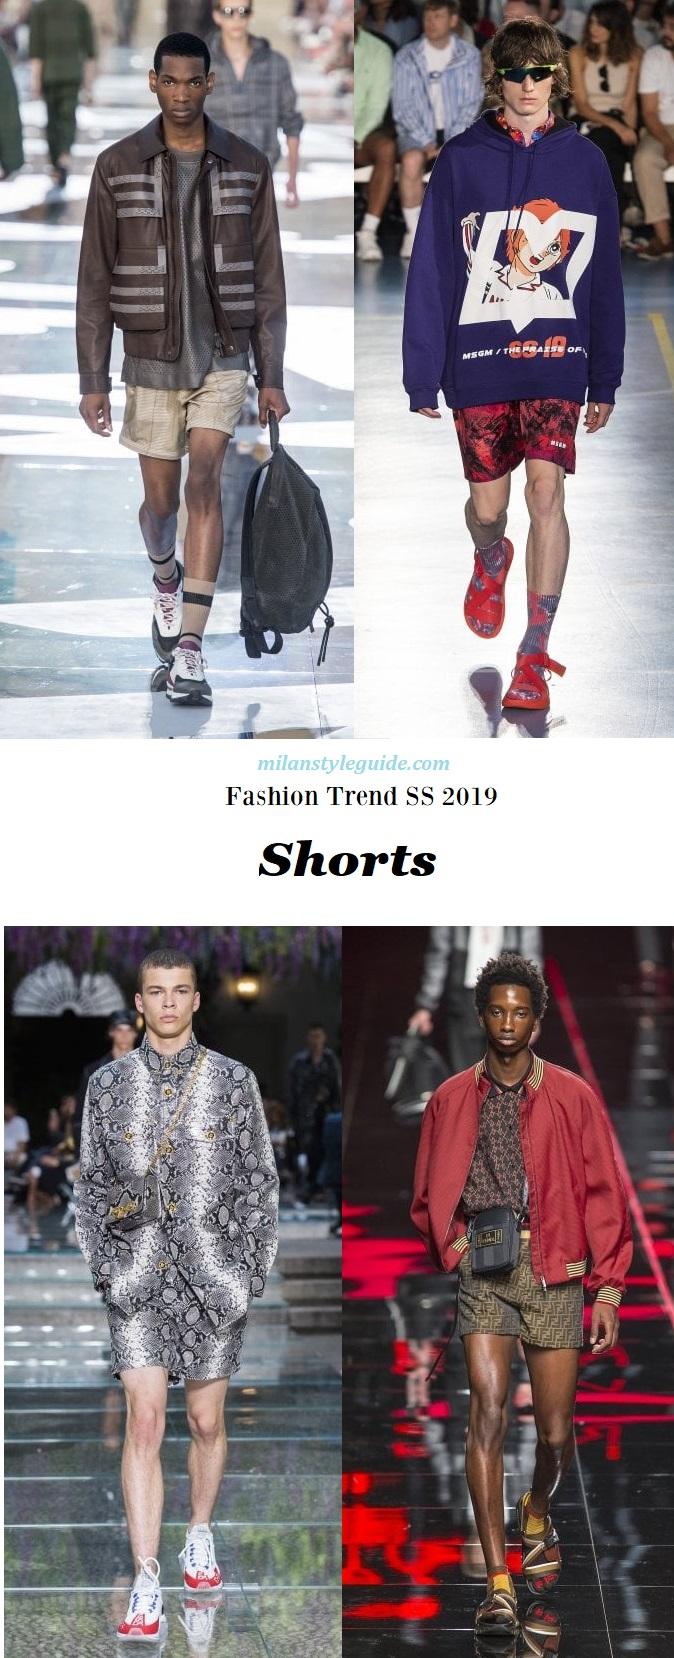 модная тенденции 2019 Fashion trend men 2019 Shorts